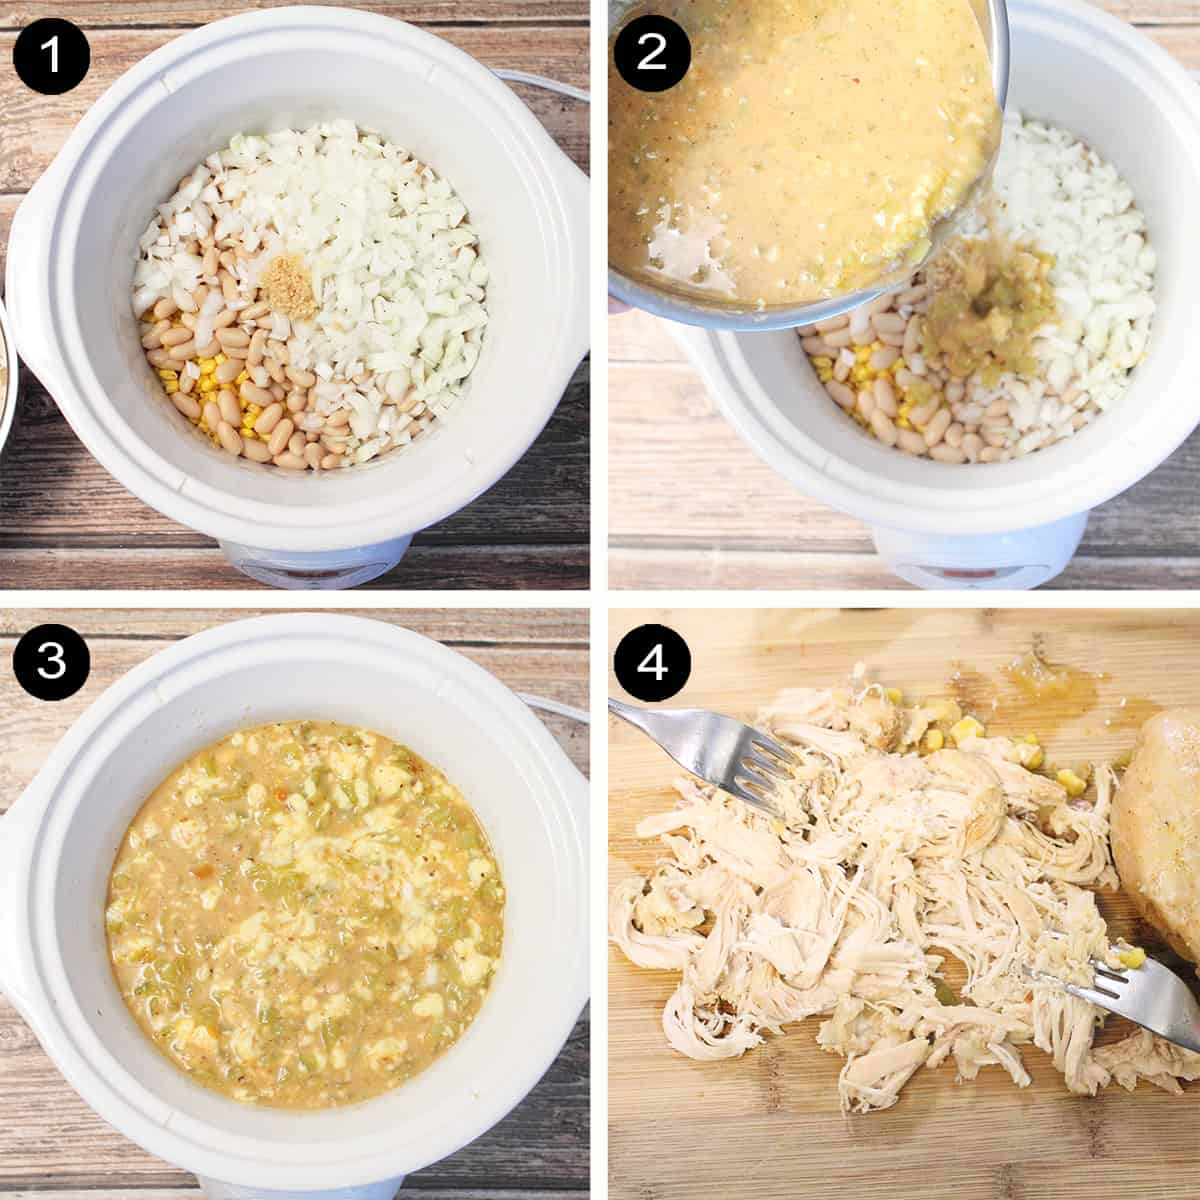 Prep steps 1-4 for crockpot chicken chili.